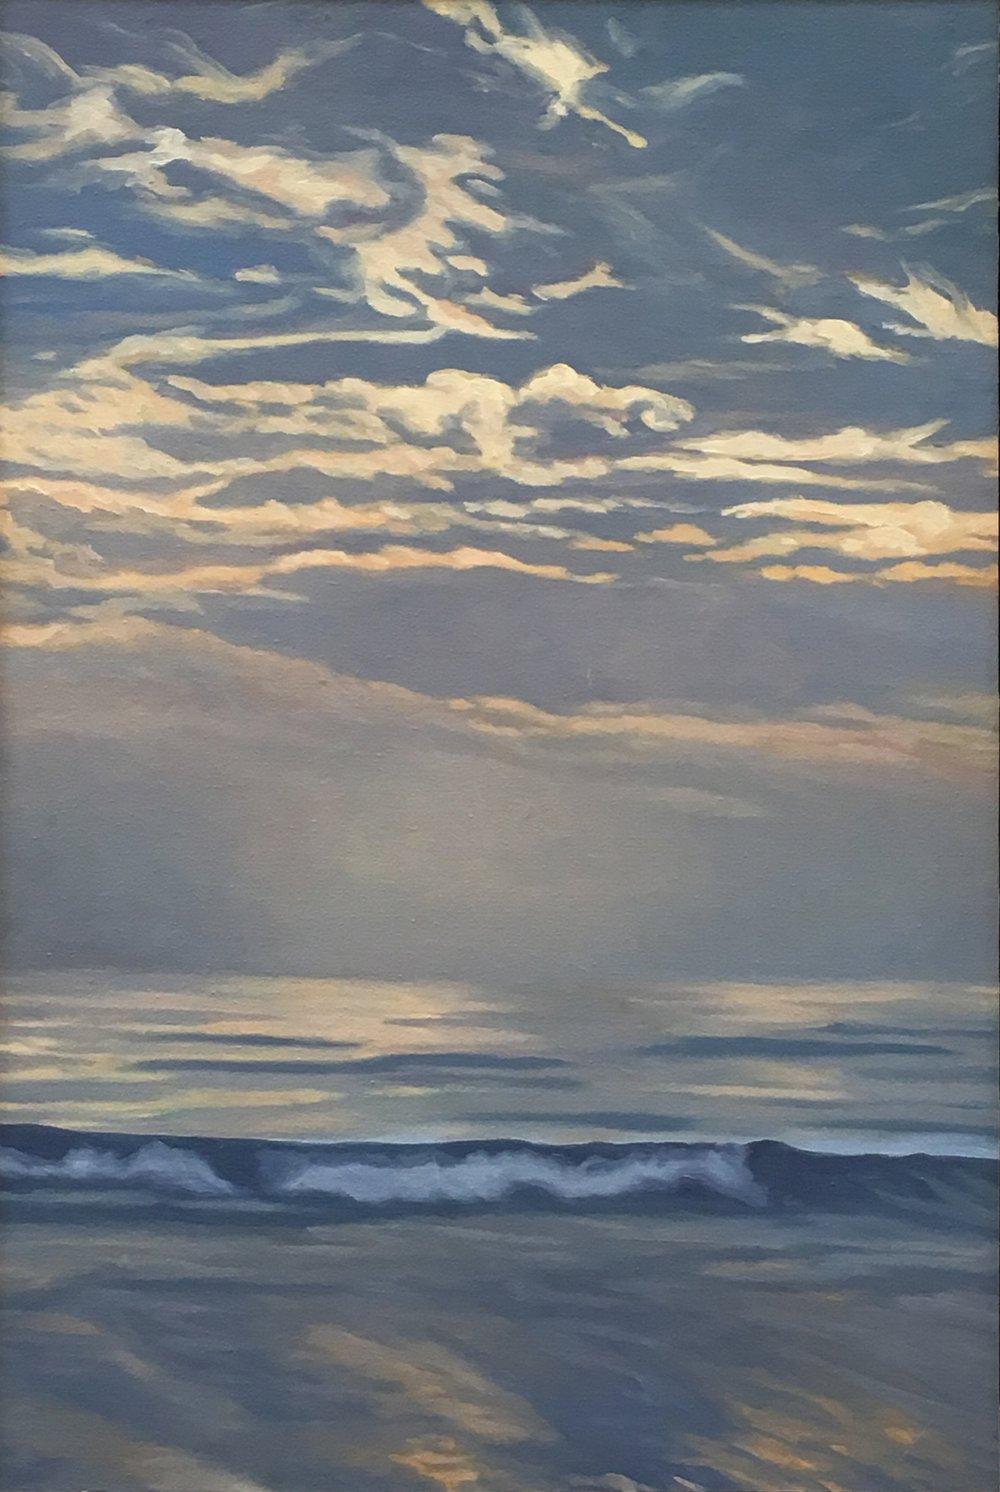 Pacific Overture III  28x20  Oil on Panel  2002